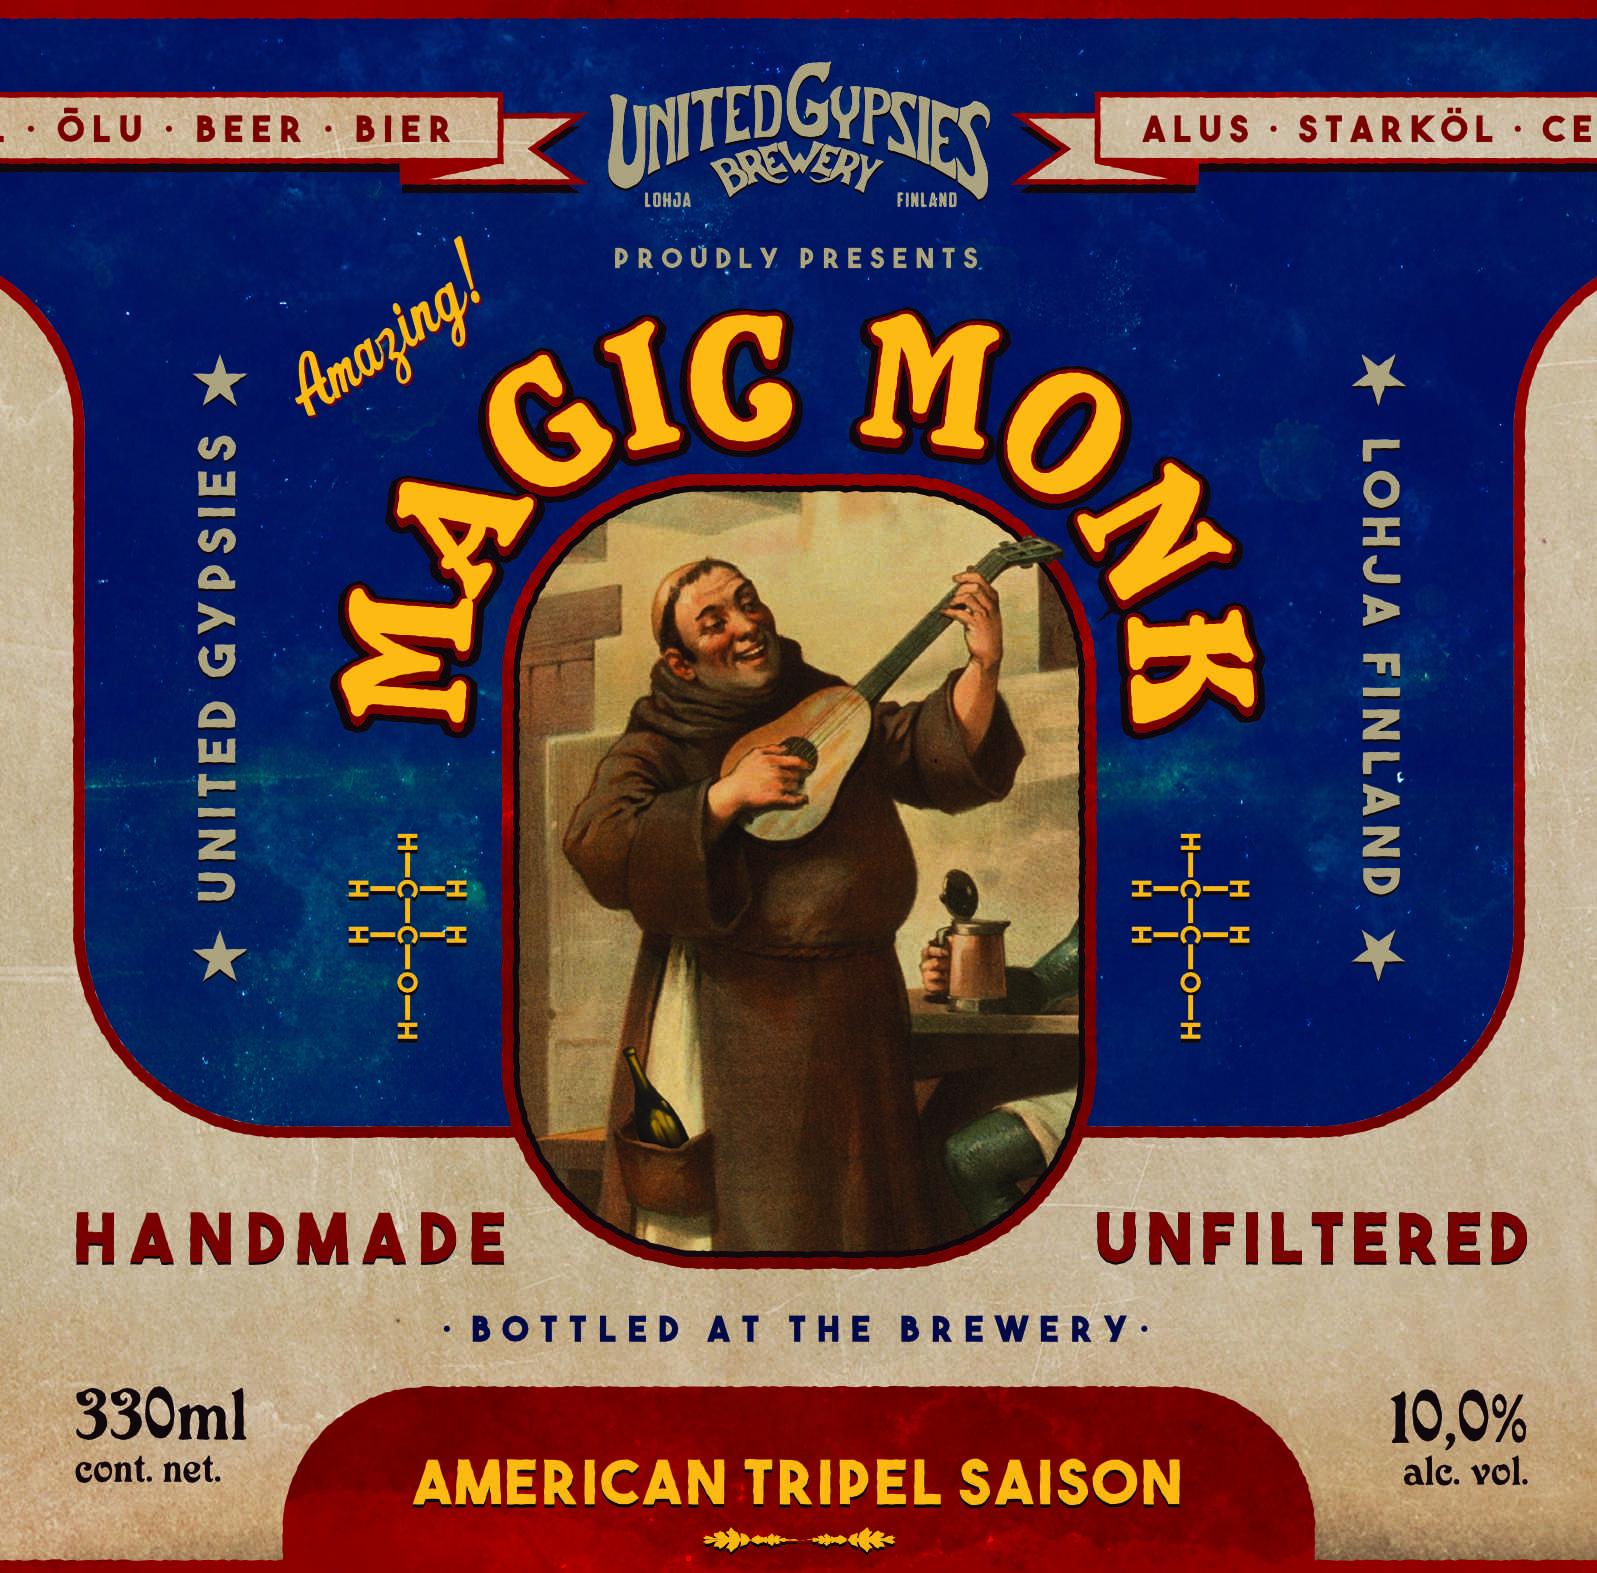 United Gypsies / Magic Monk / 10% / 0,33 Pullo